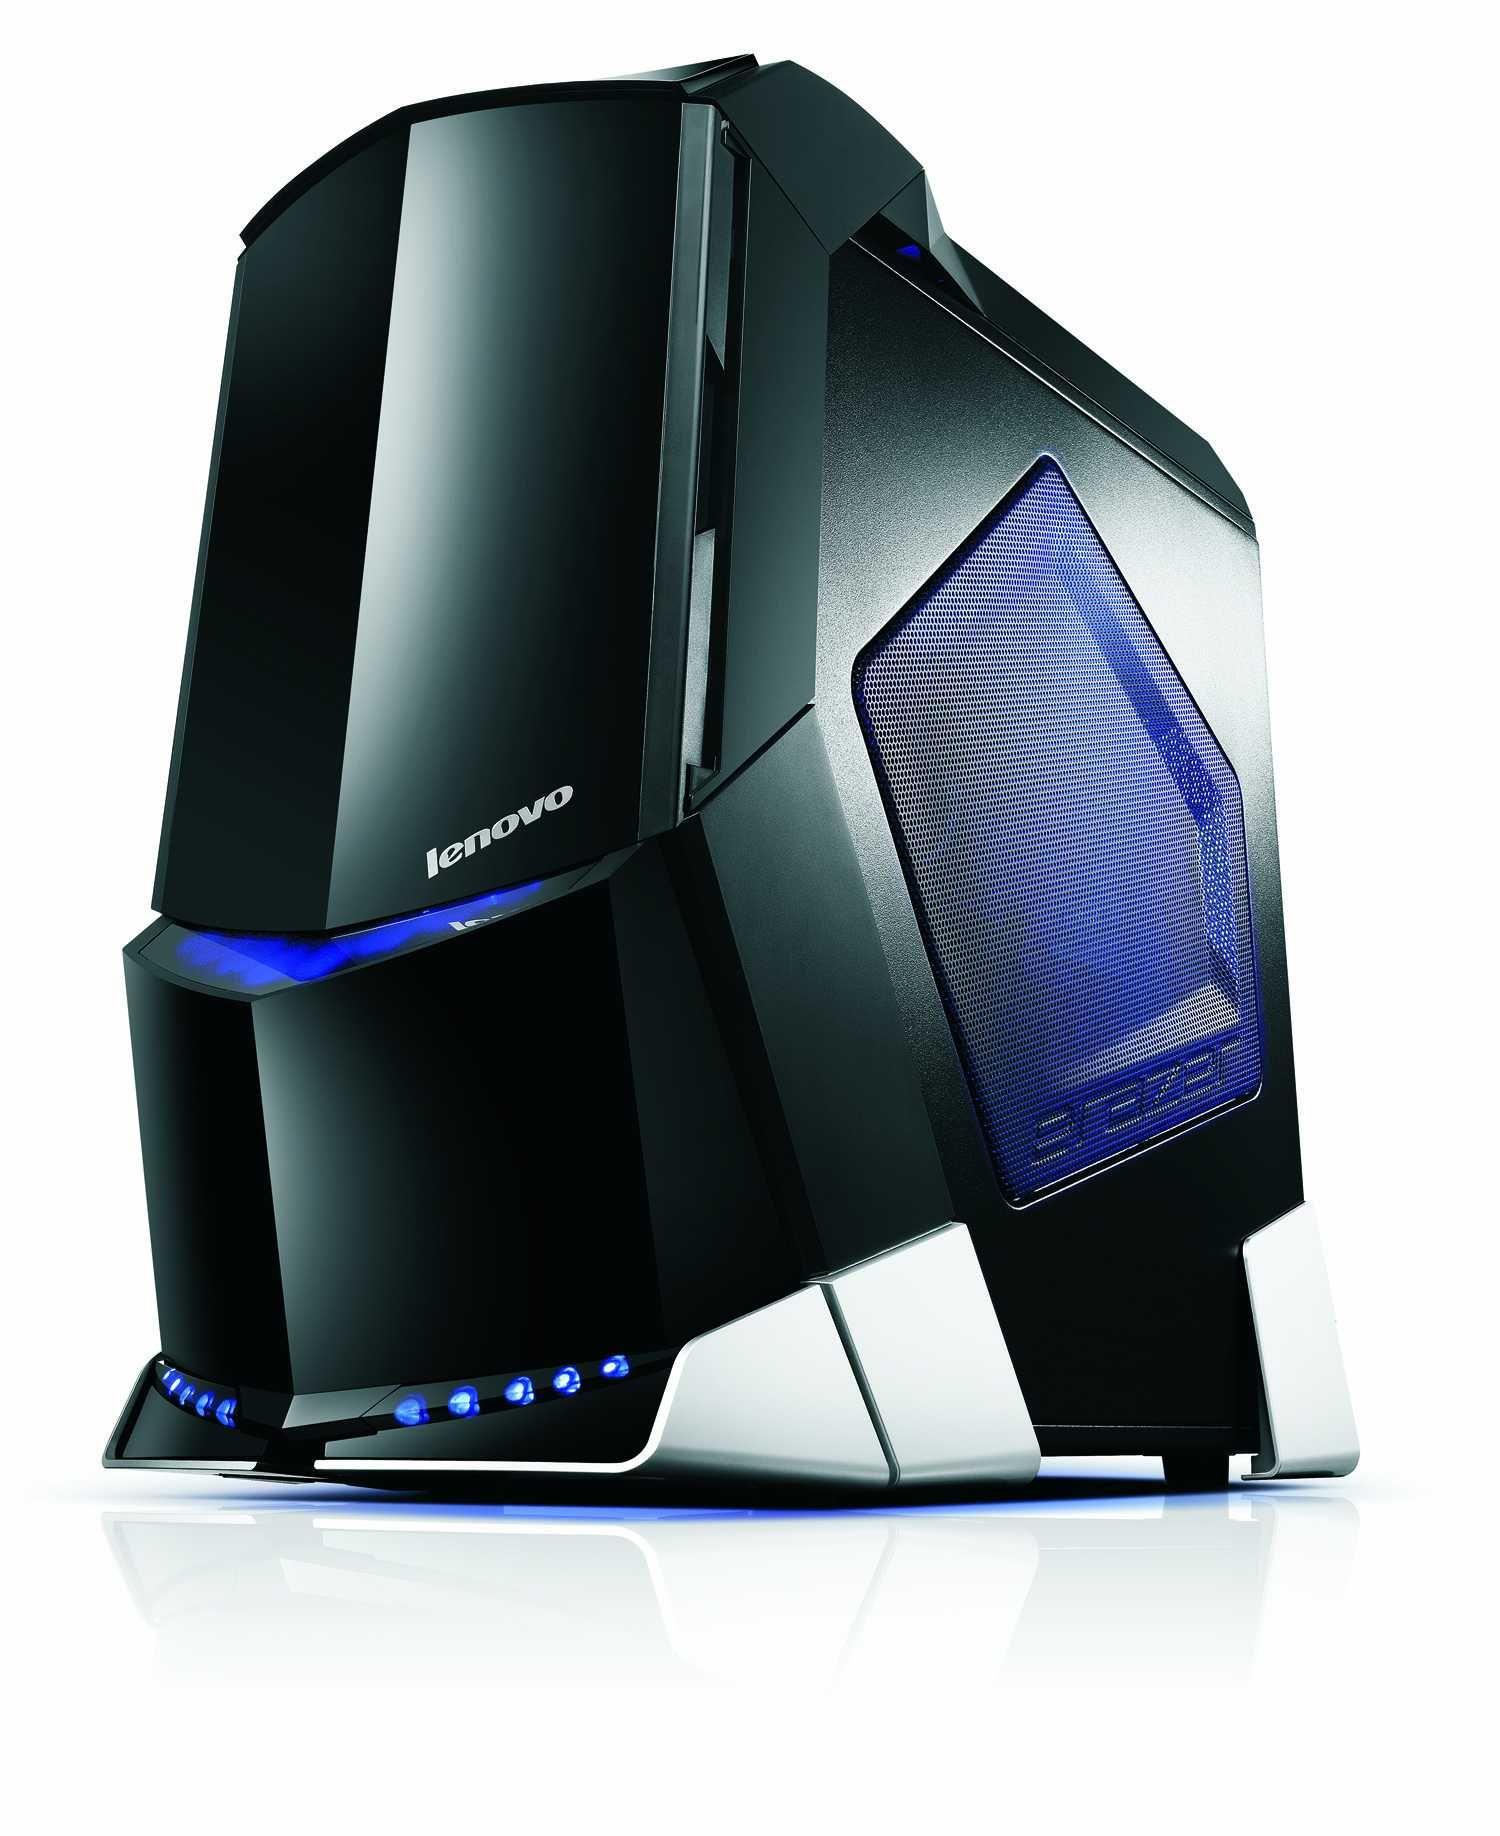 Lenovo Erazer X700 Desktop Targets Pc Gamers Lenovo Gaming Desktop Computer